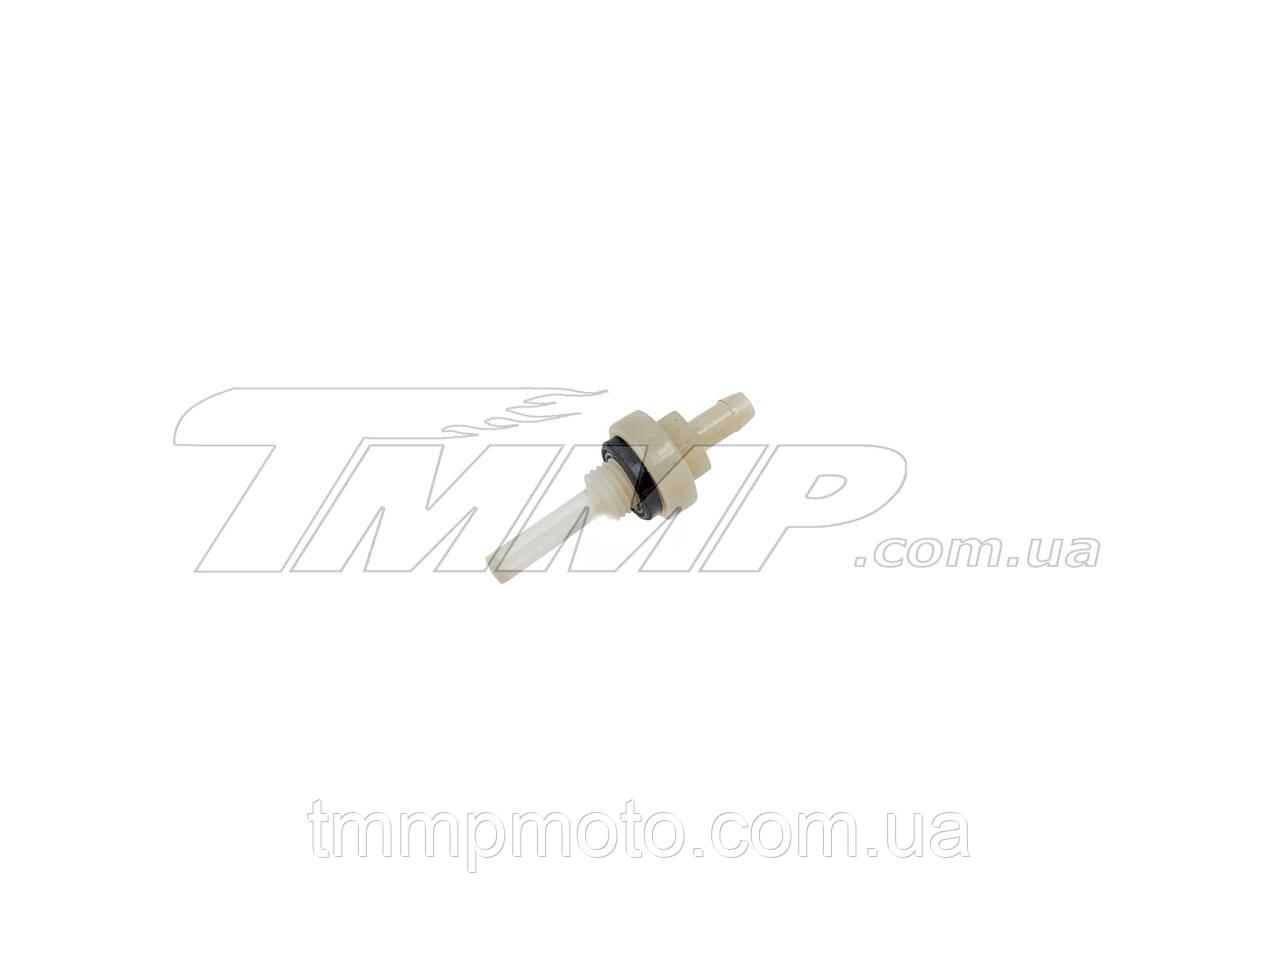 Фильтр топливный 168F Артикул: F-1091